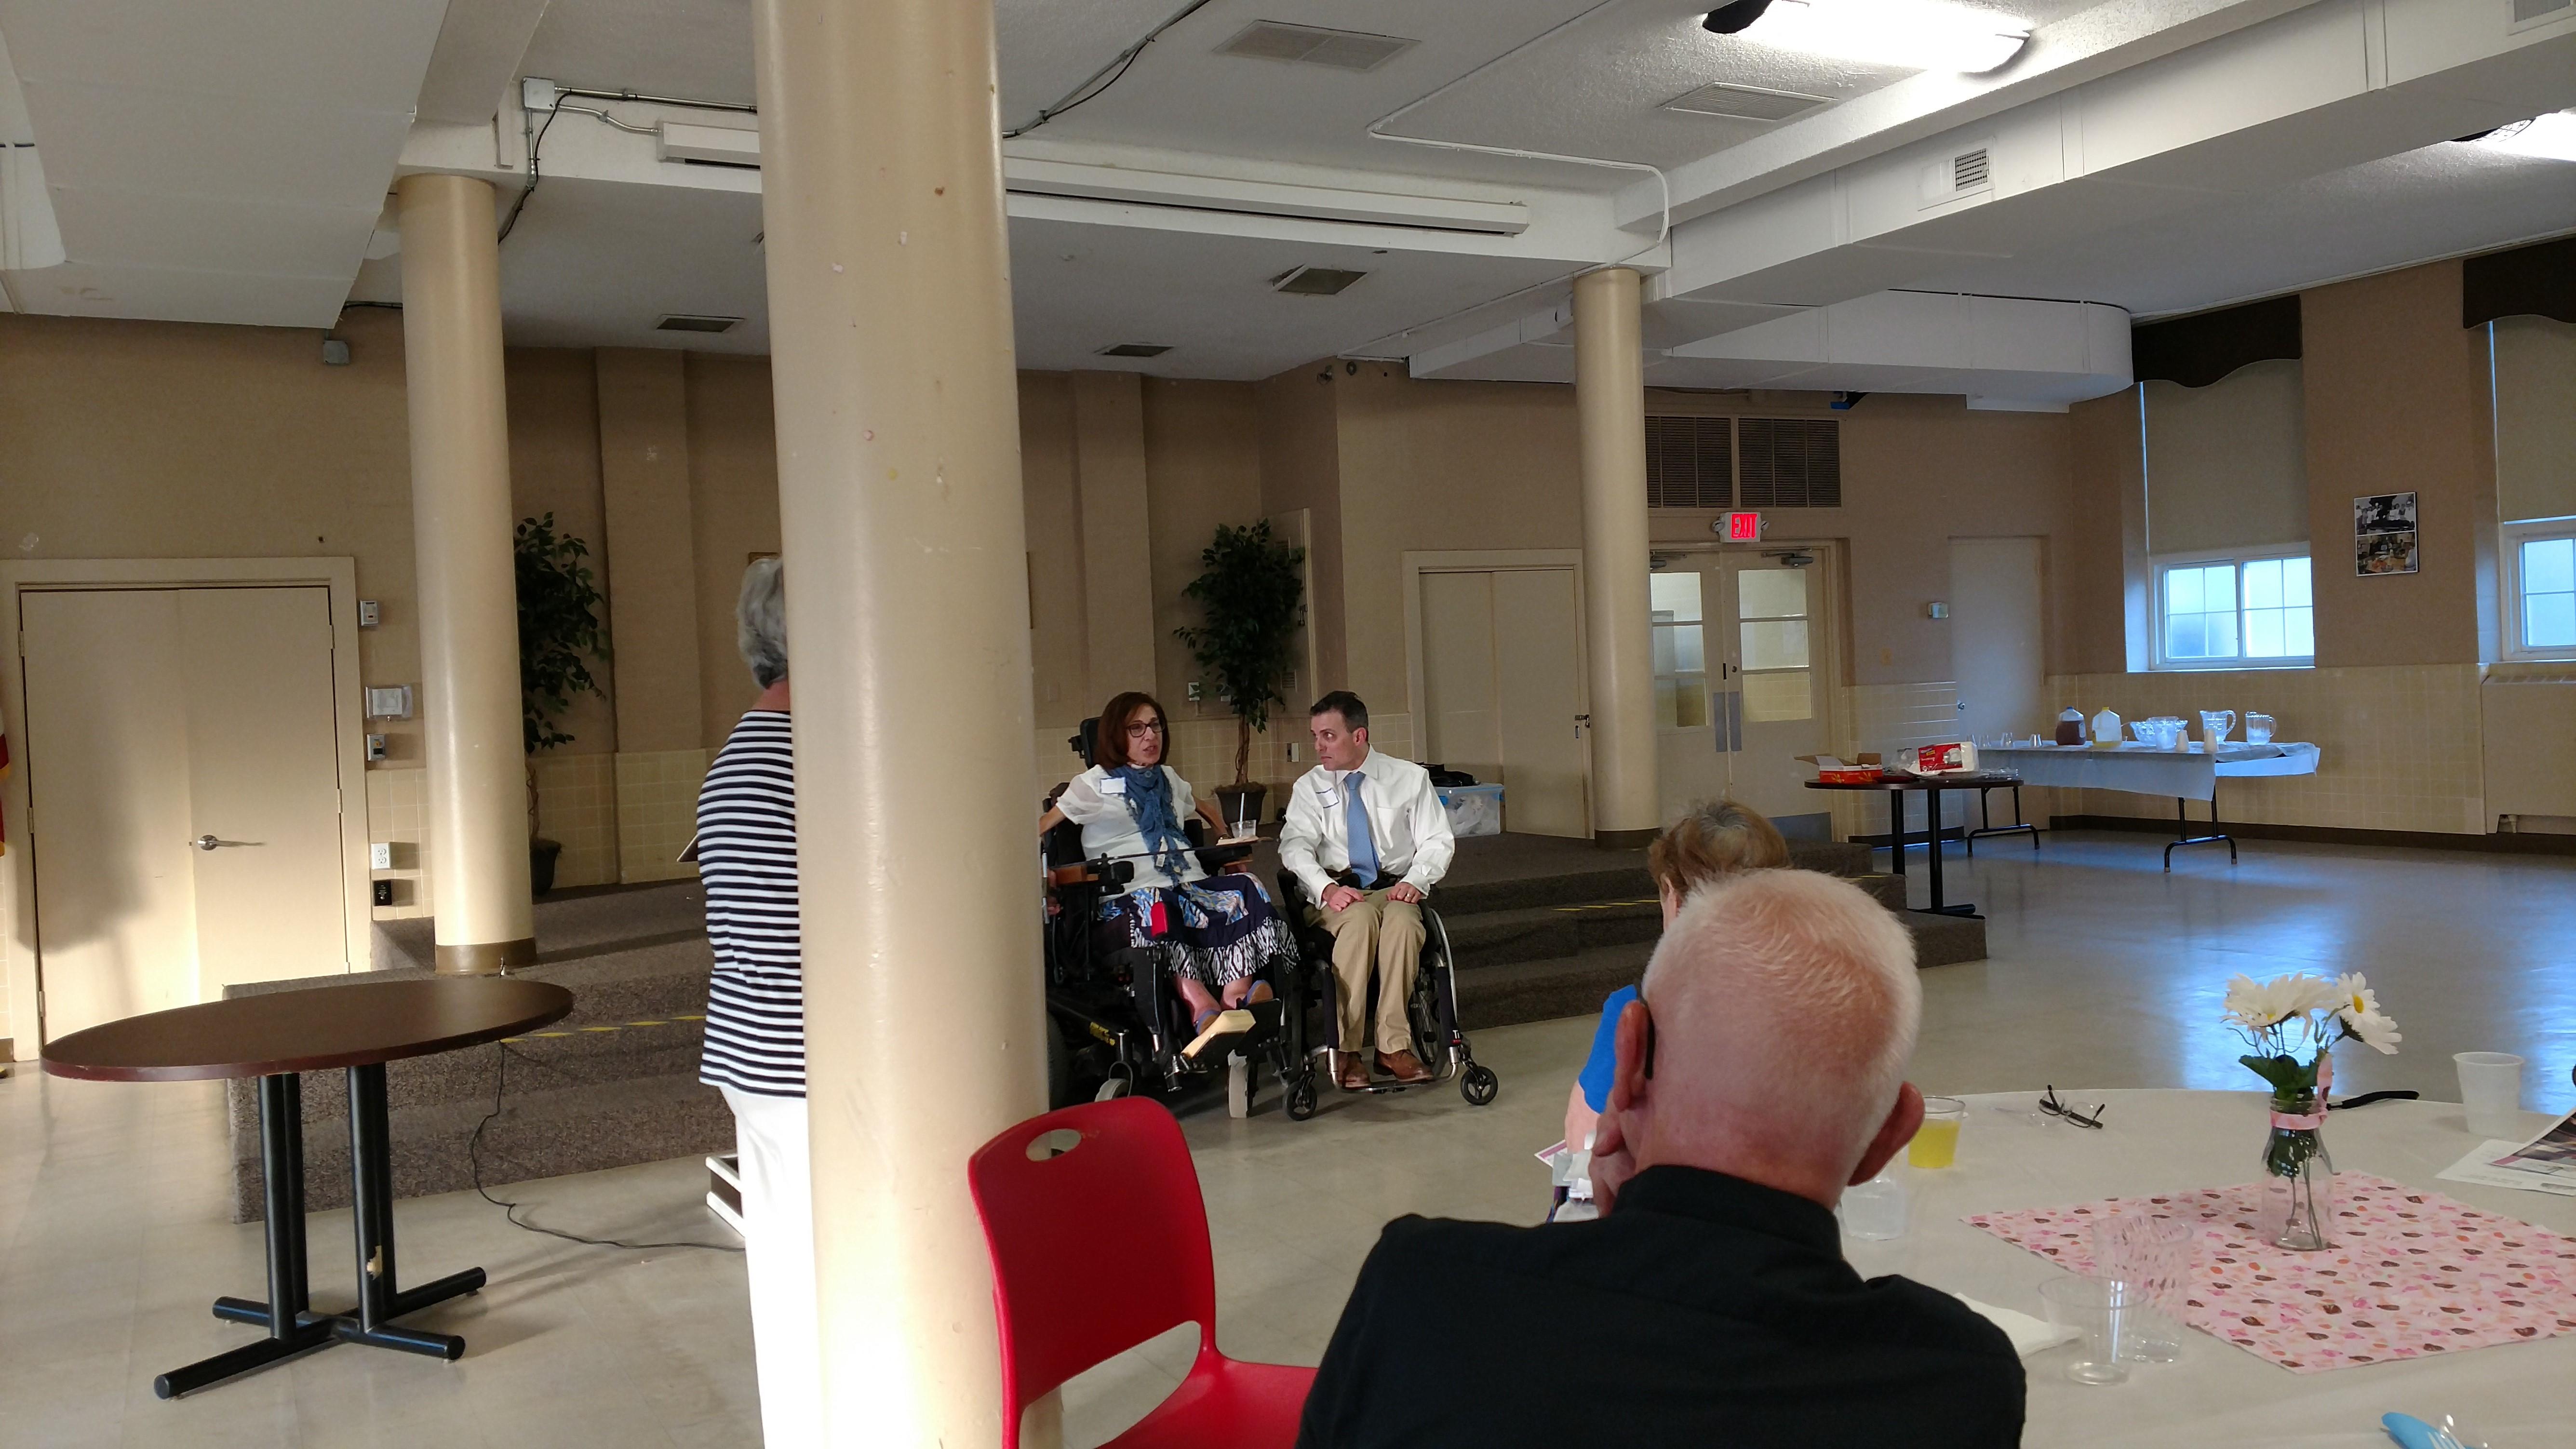 Speaking to the St. James Seniors